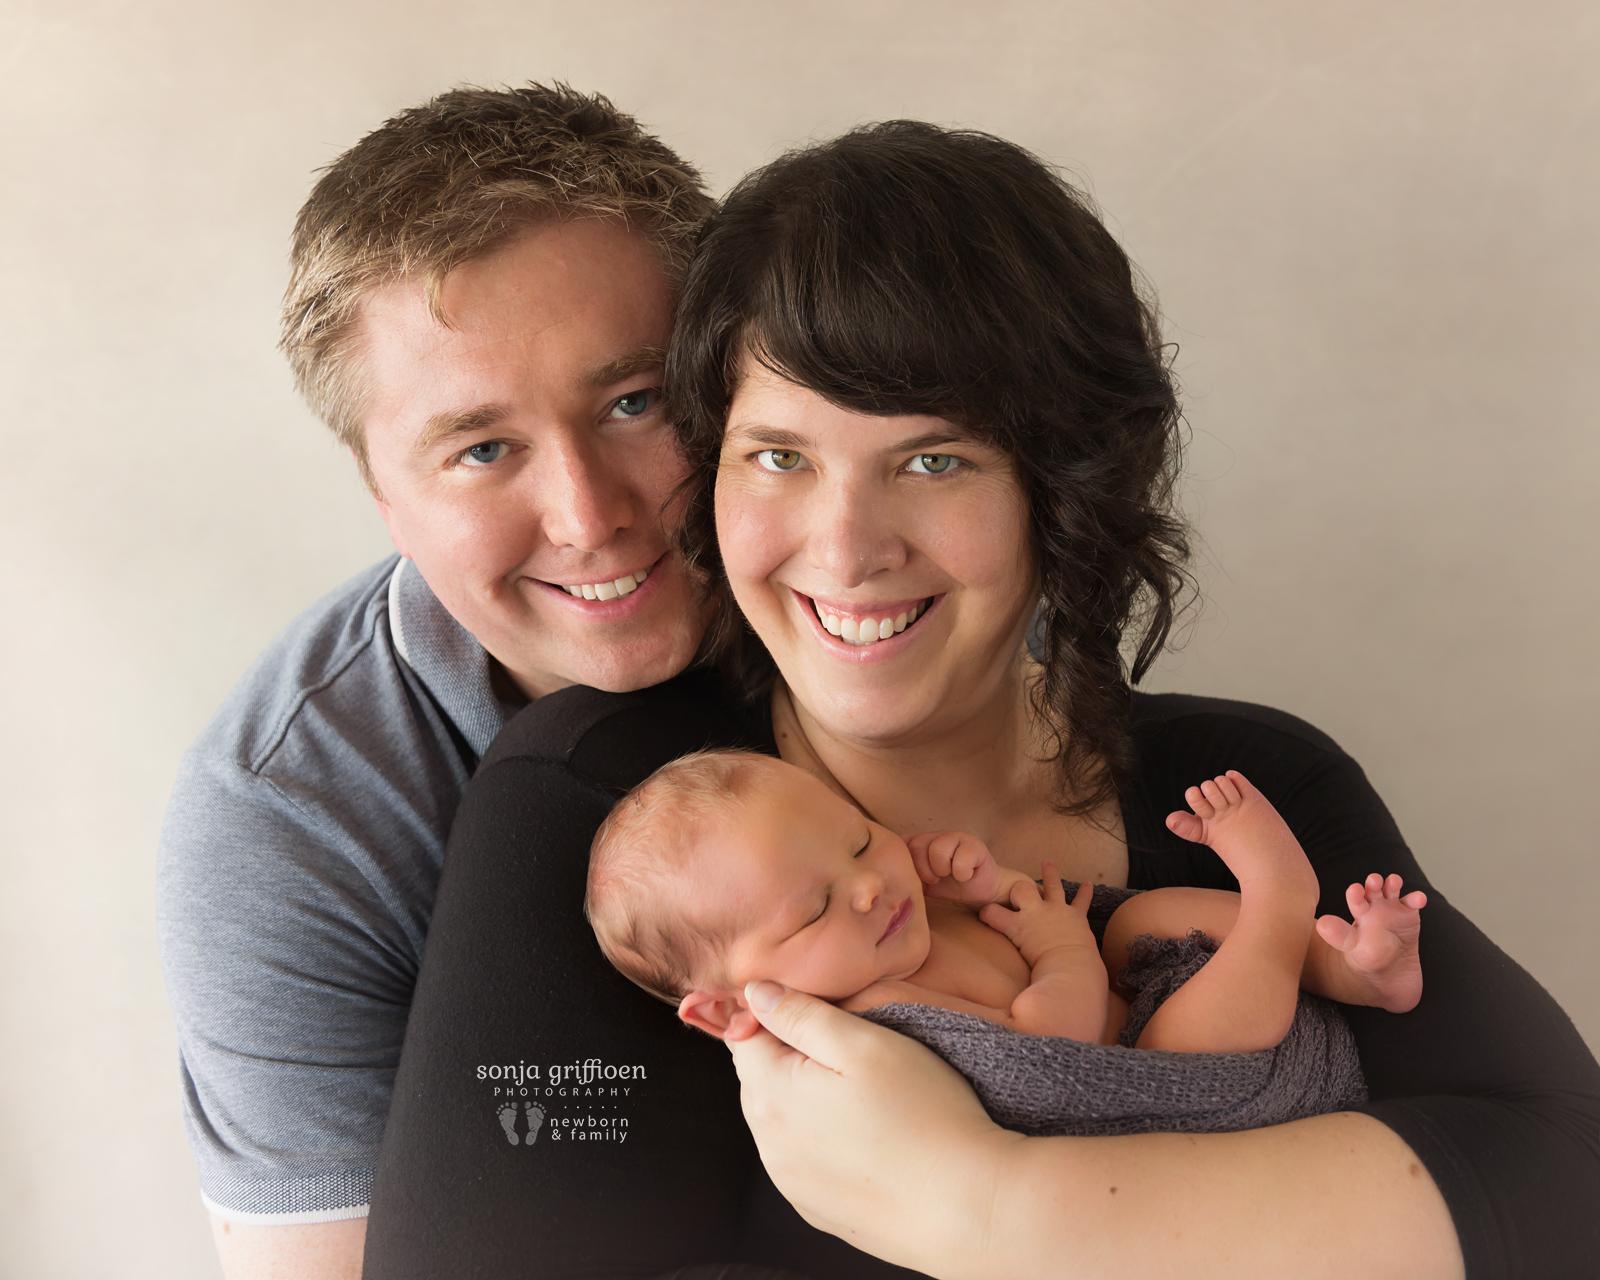 Peter-Newborn-Brisbane-Newborn-Photographer-Sonja-Griffioen-17.jpg